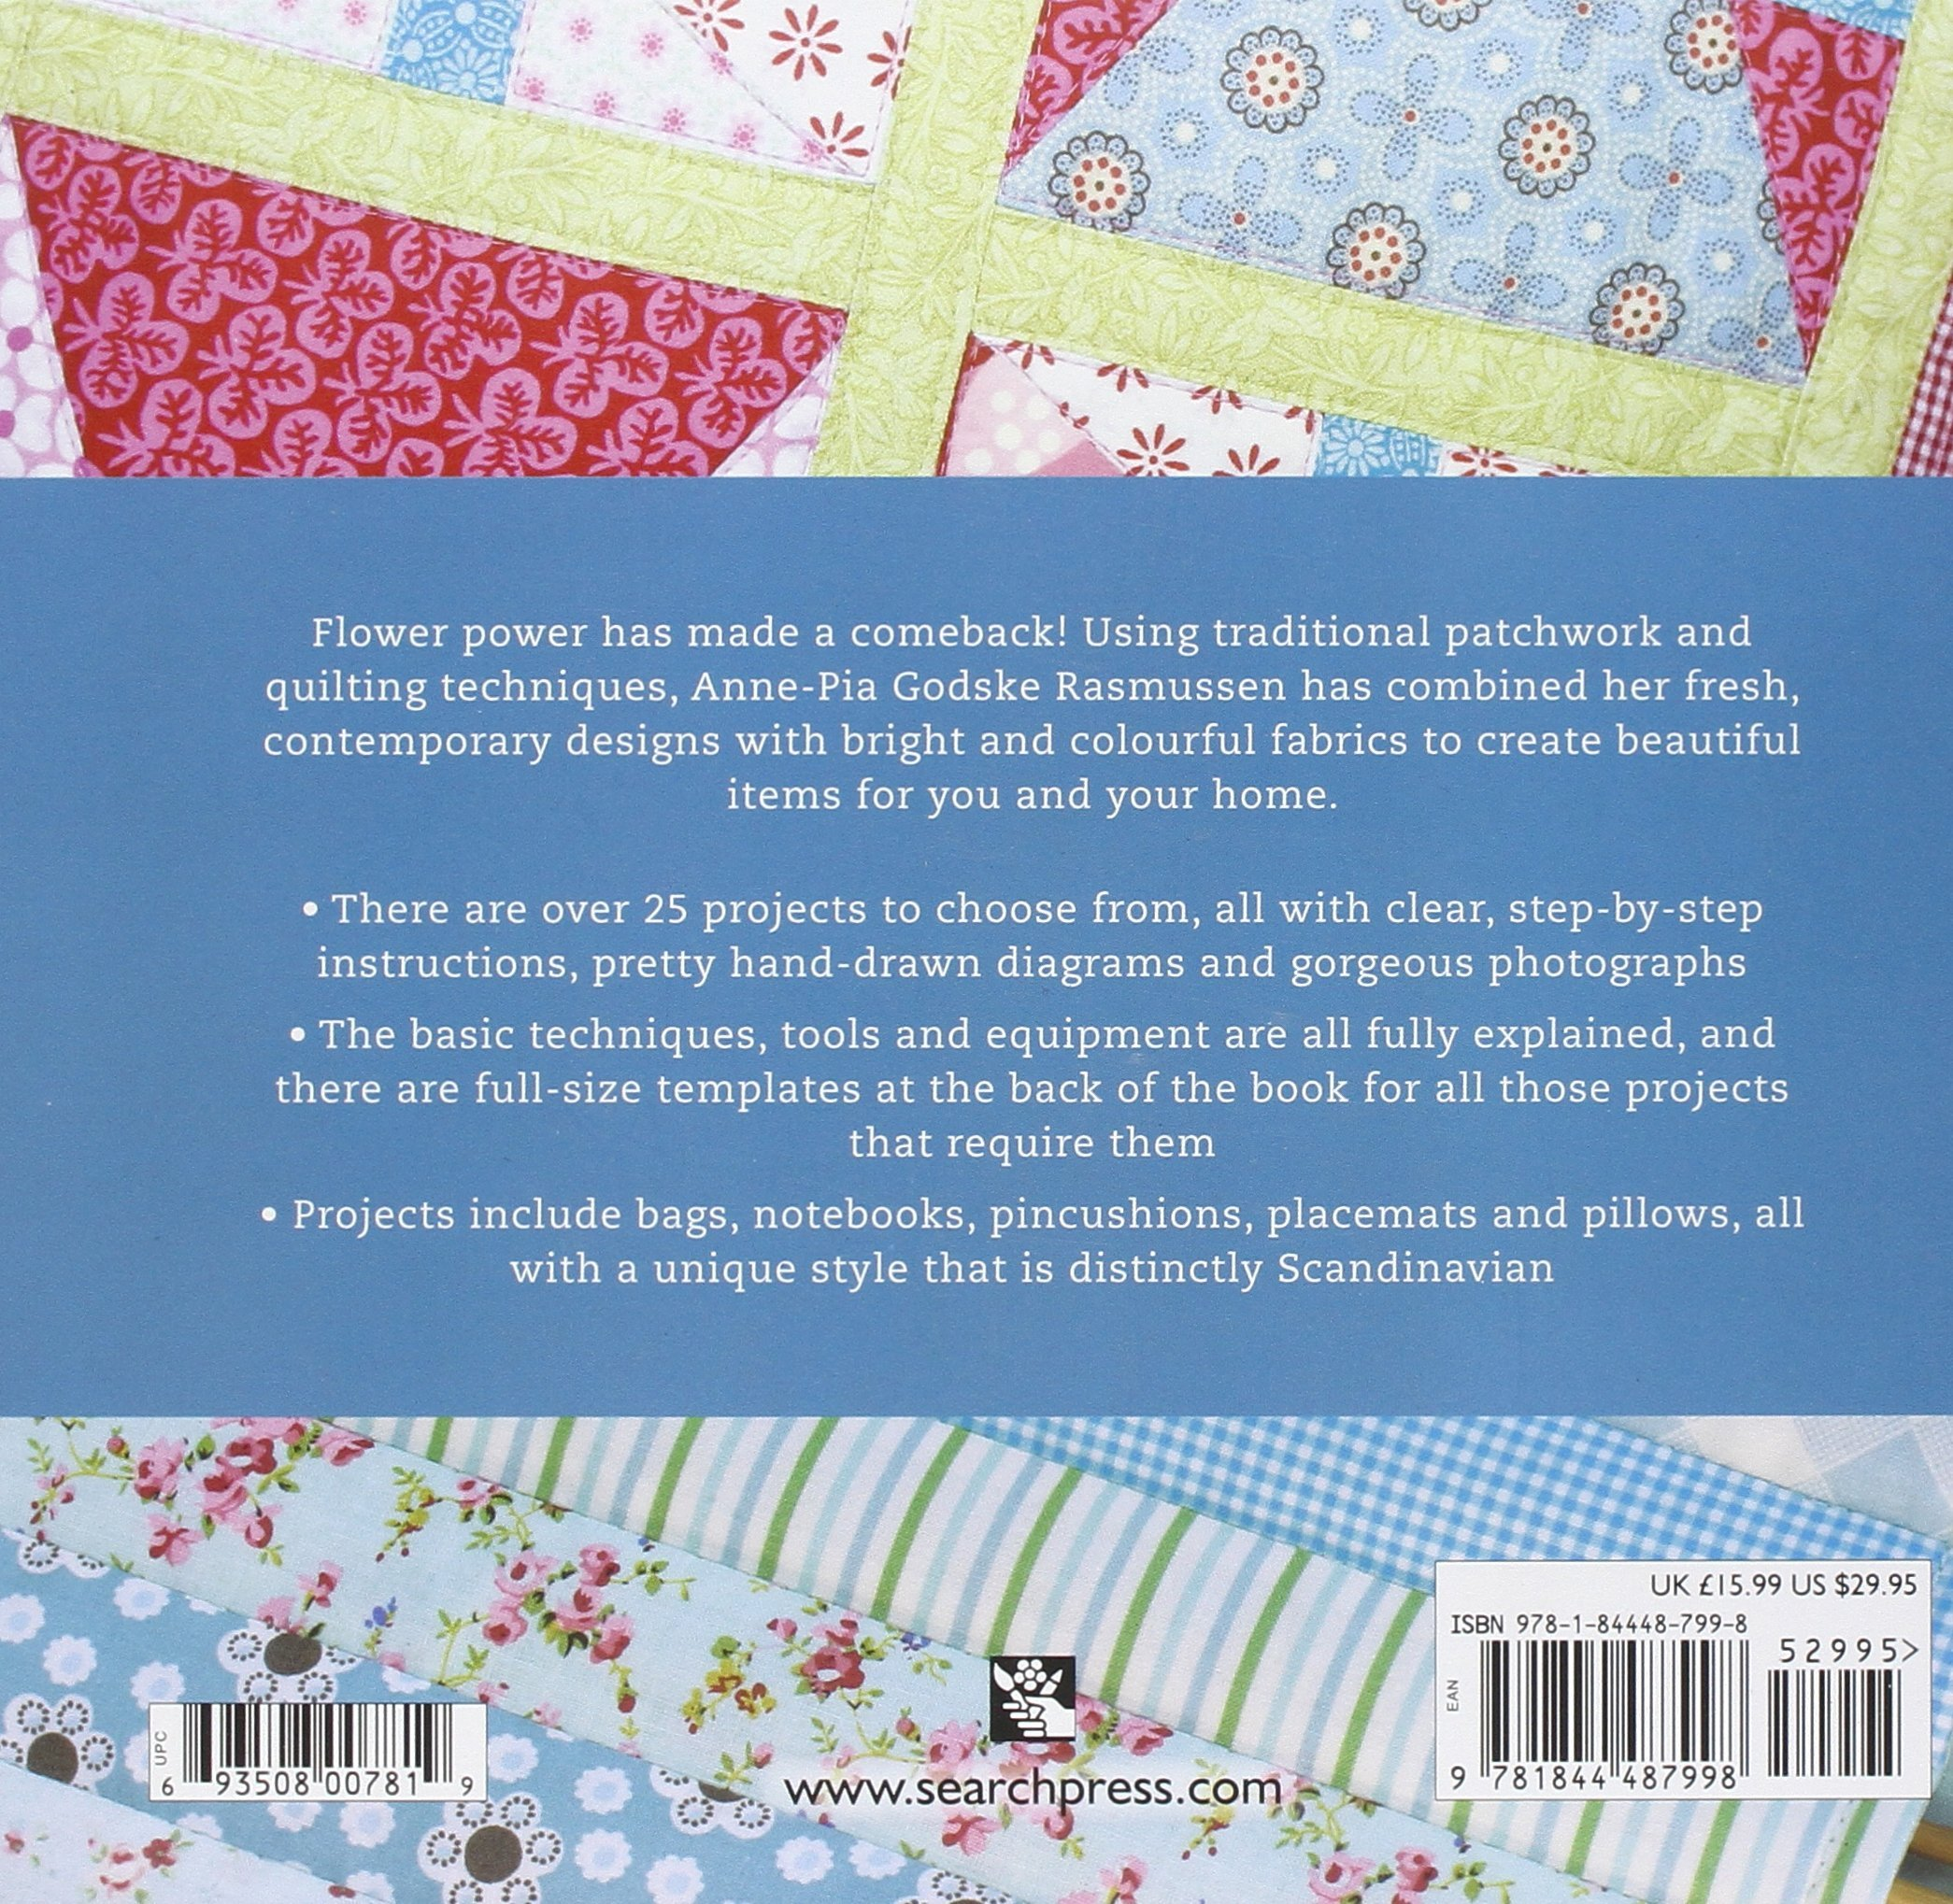 Flower Power Patchwork: Anne-Pia Godske Rasmussen: 9781844487998 ...